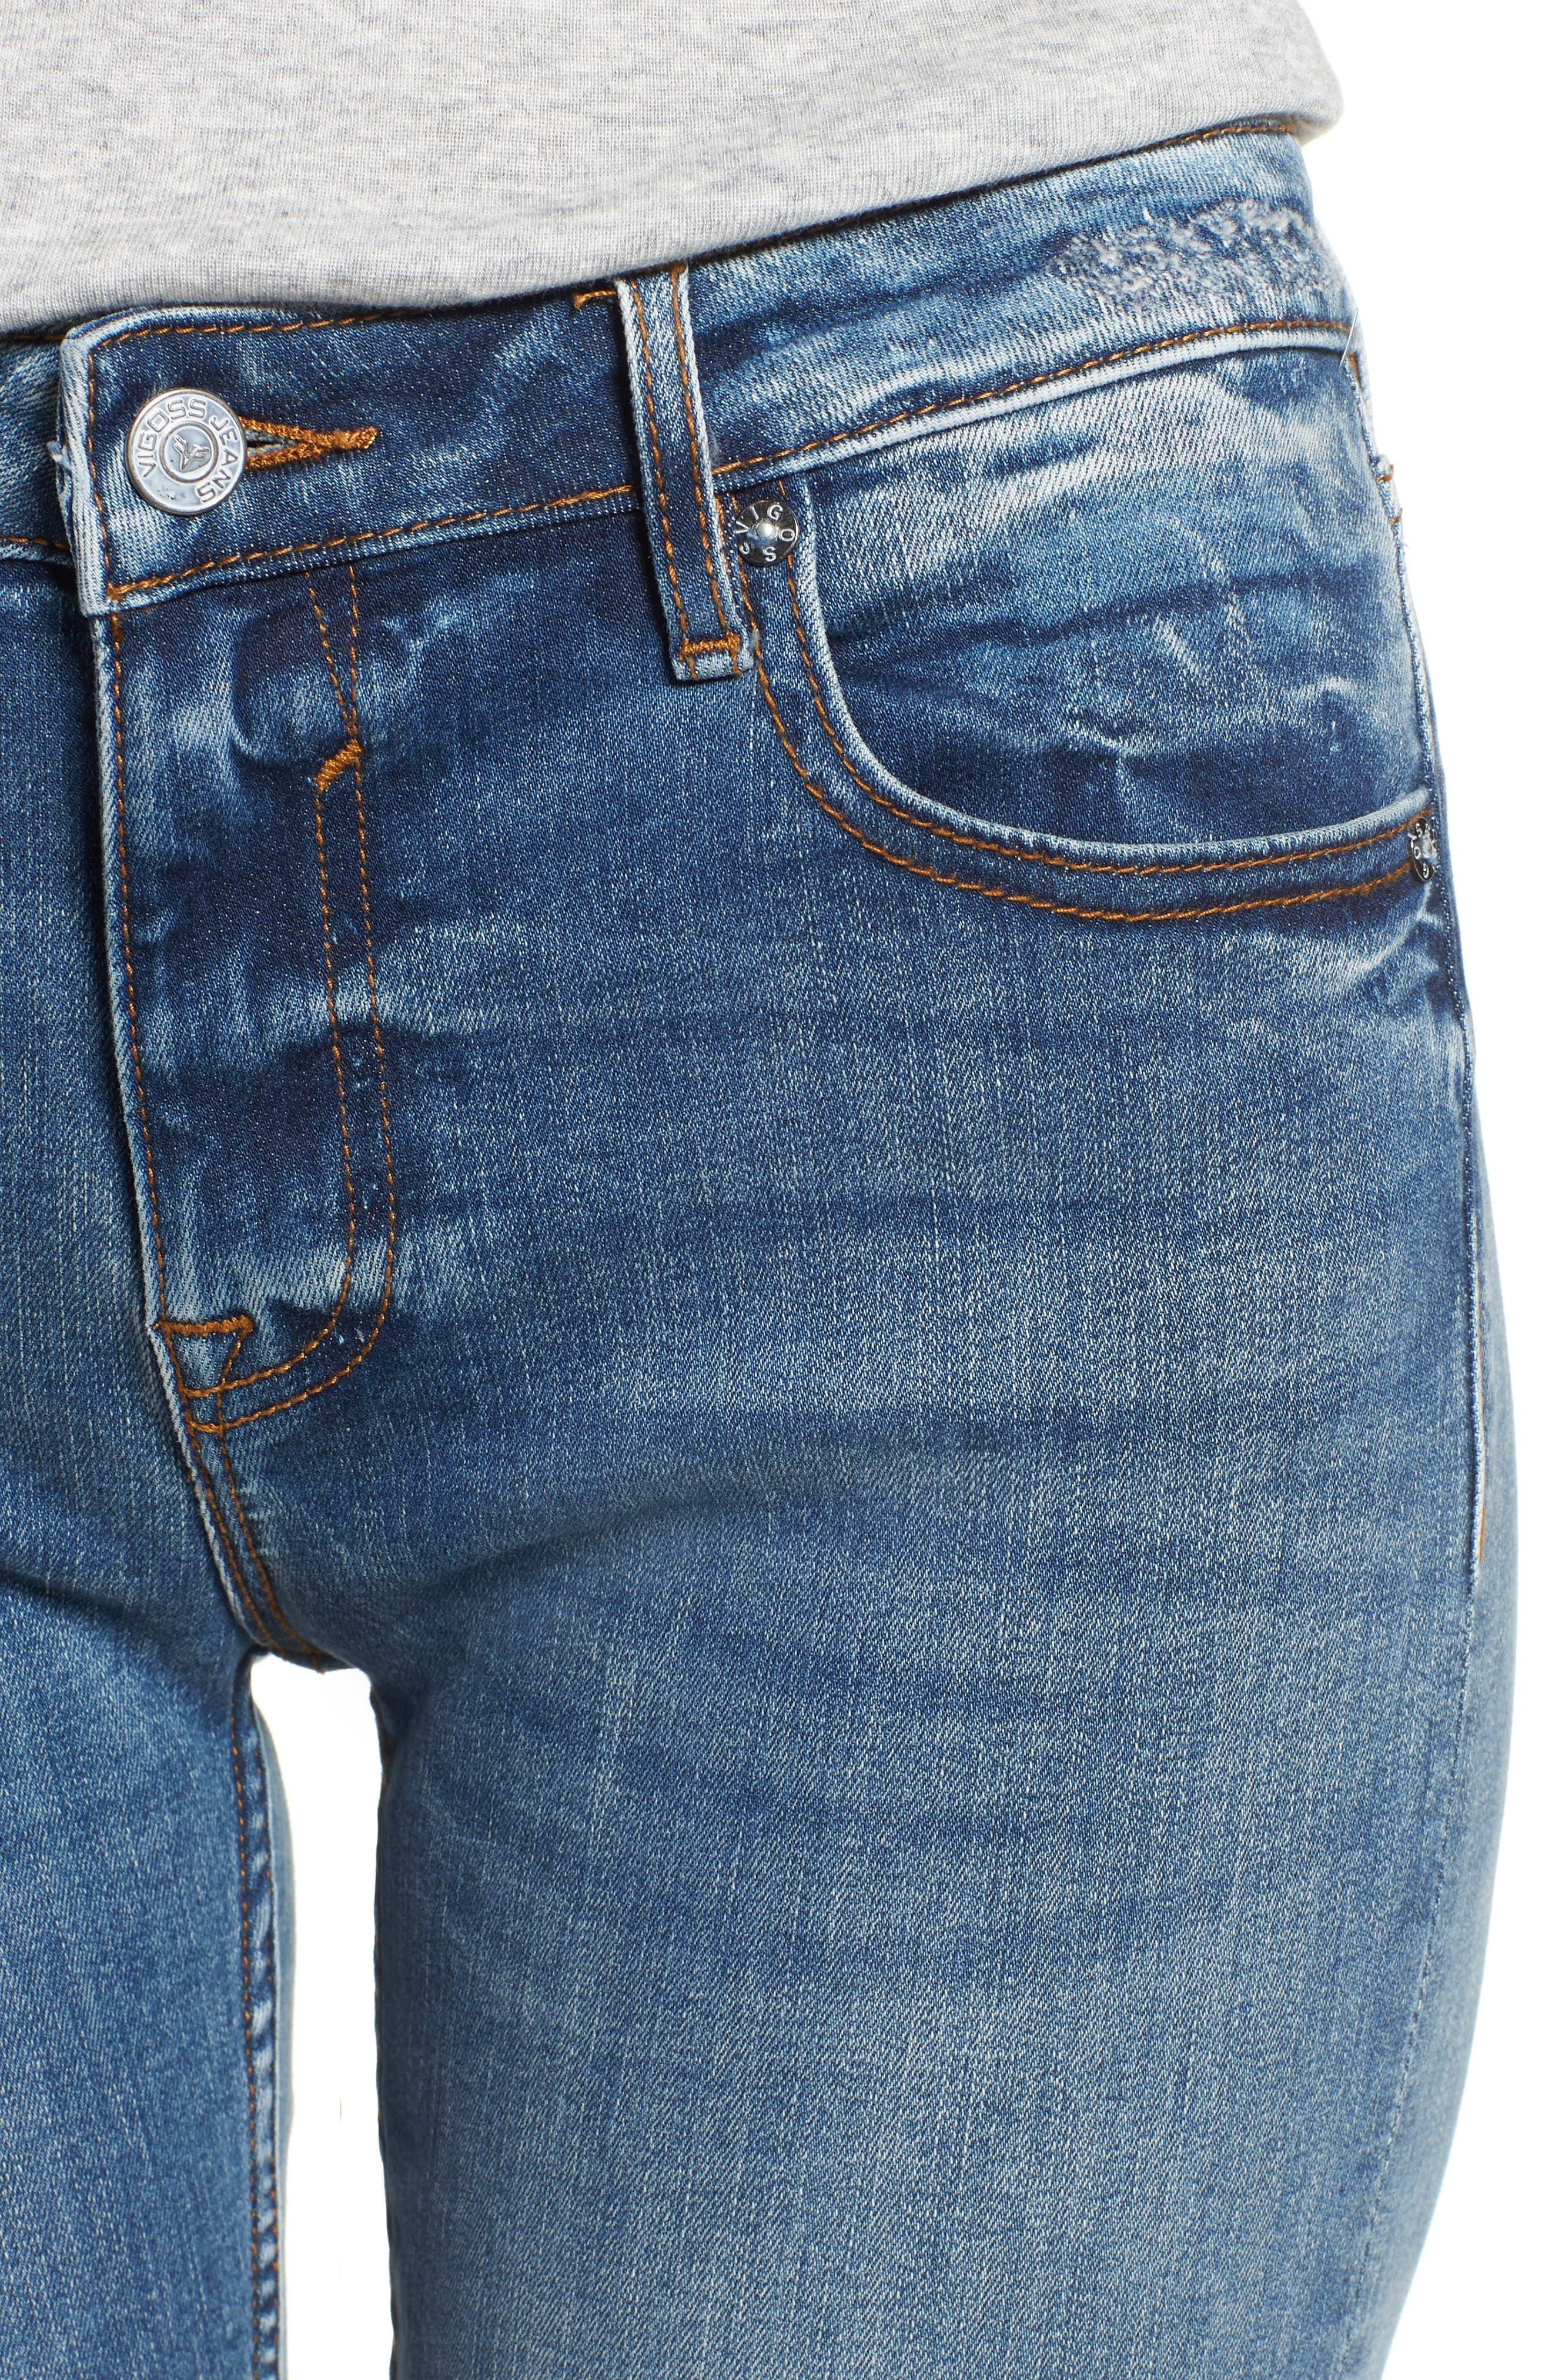 Jagger Crop Straight Leg Jeans,                             Alternate thumbnail 4, color,                             400